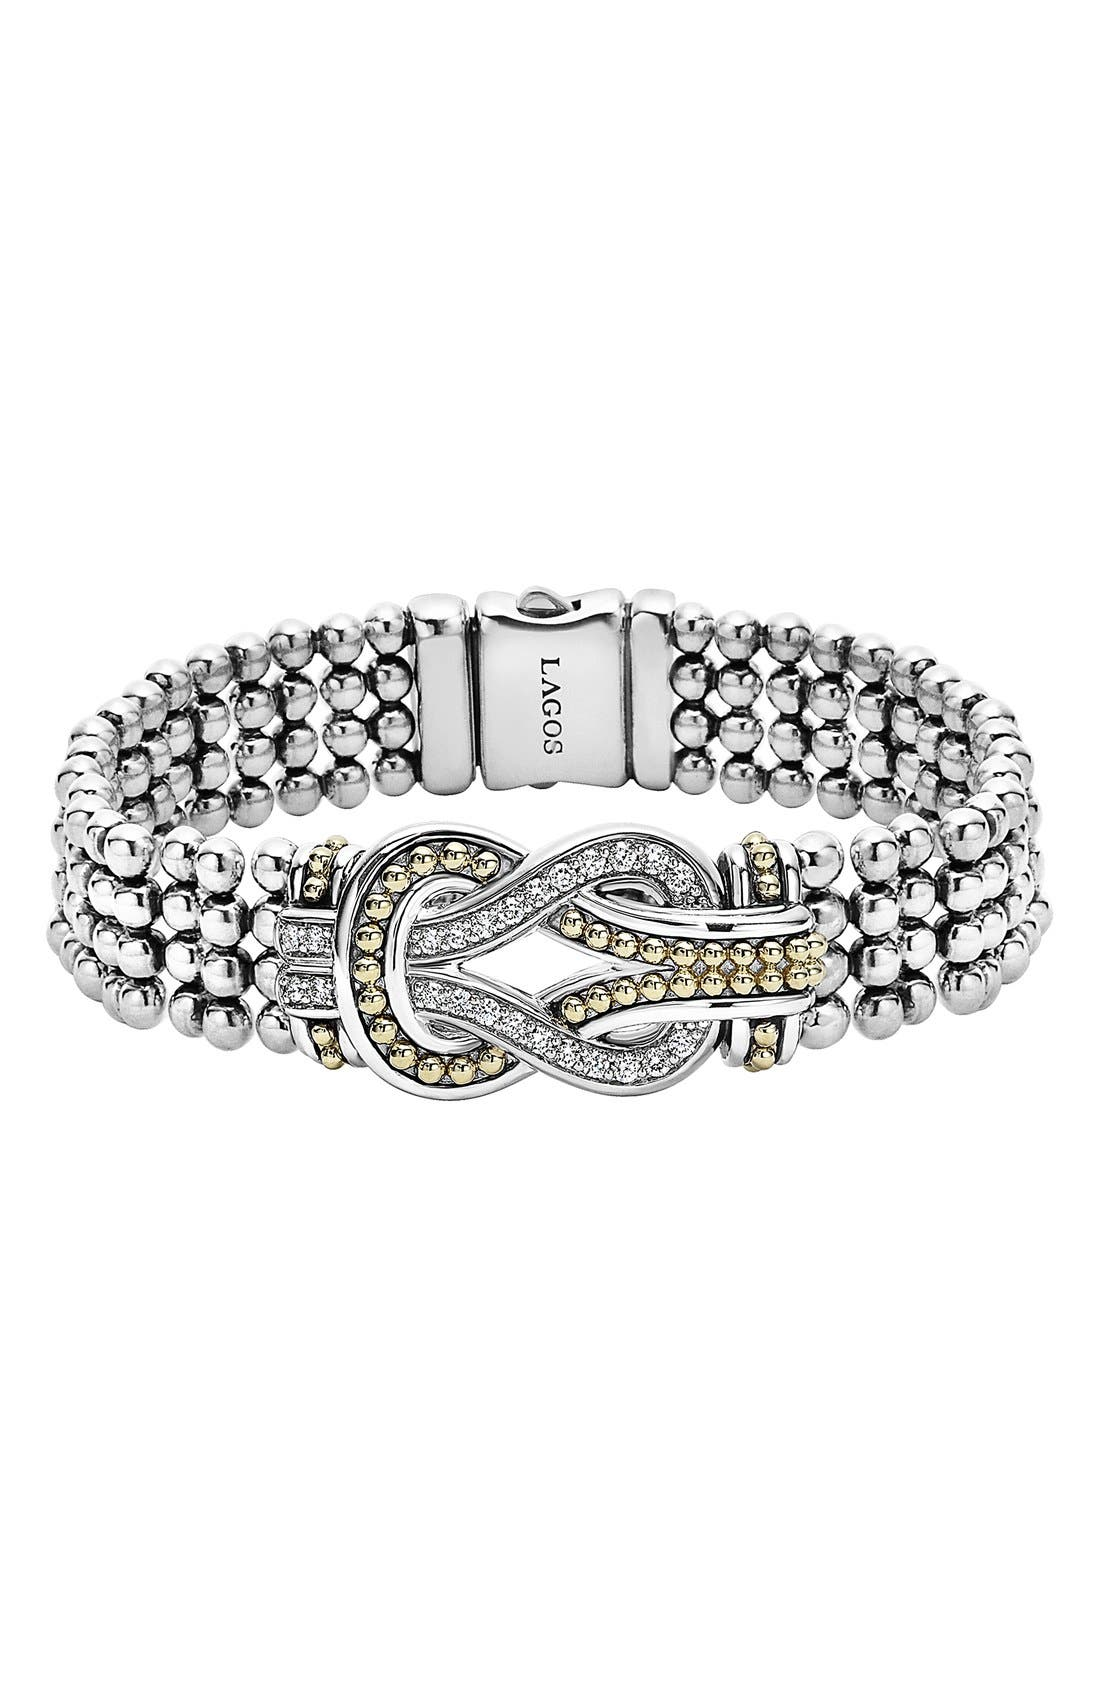 Main Image - LAGOS 'Newport' Diamond Knot Flat Caviar Bracelet